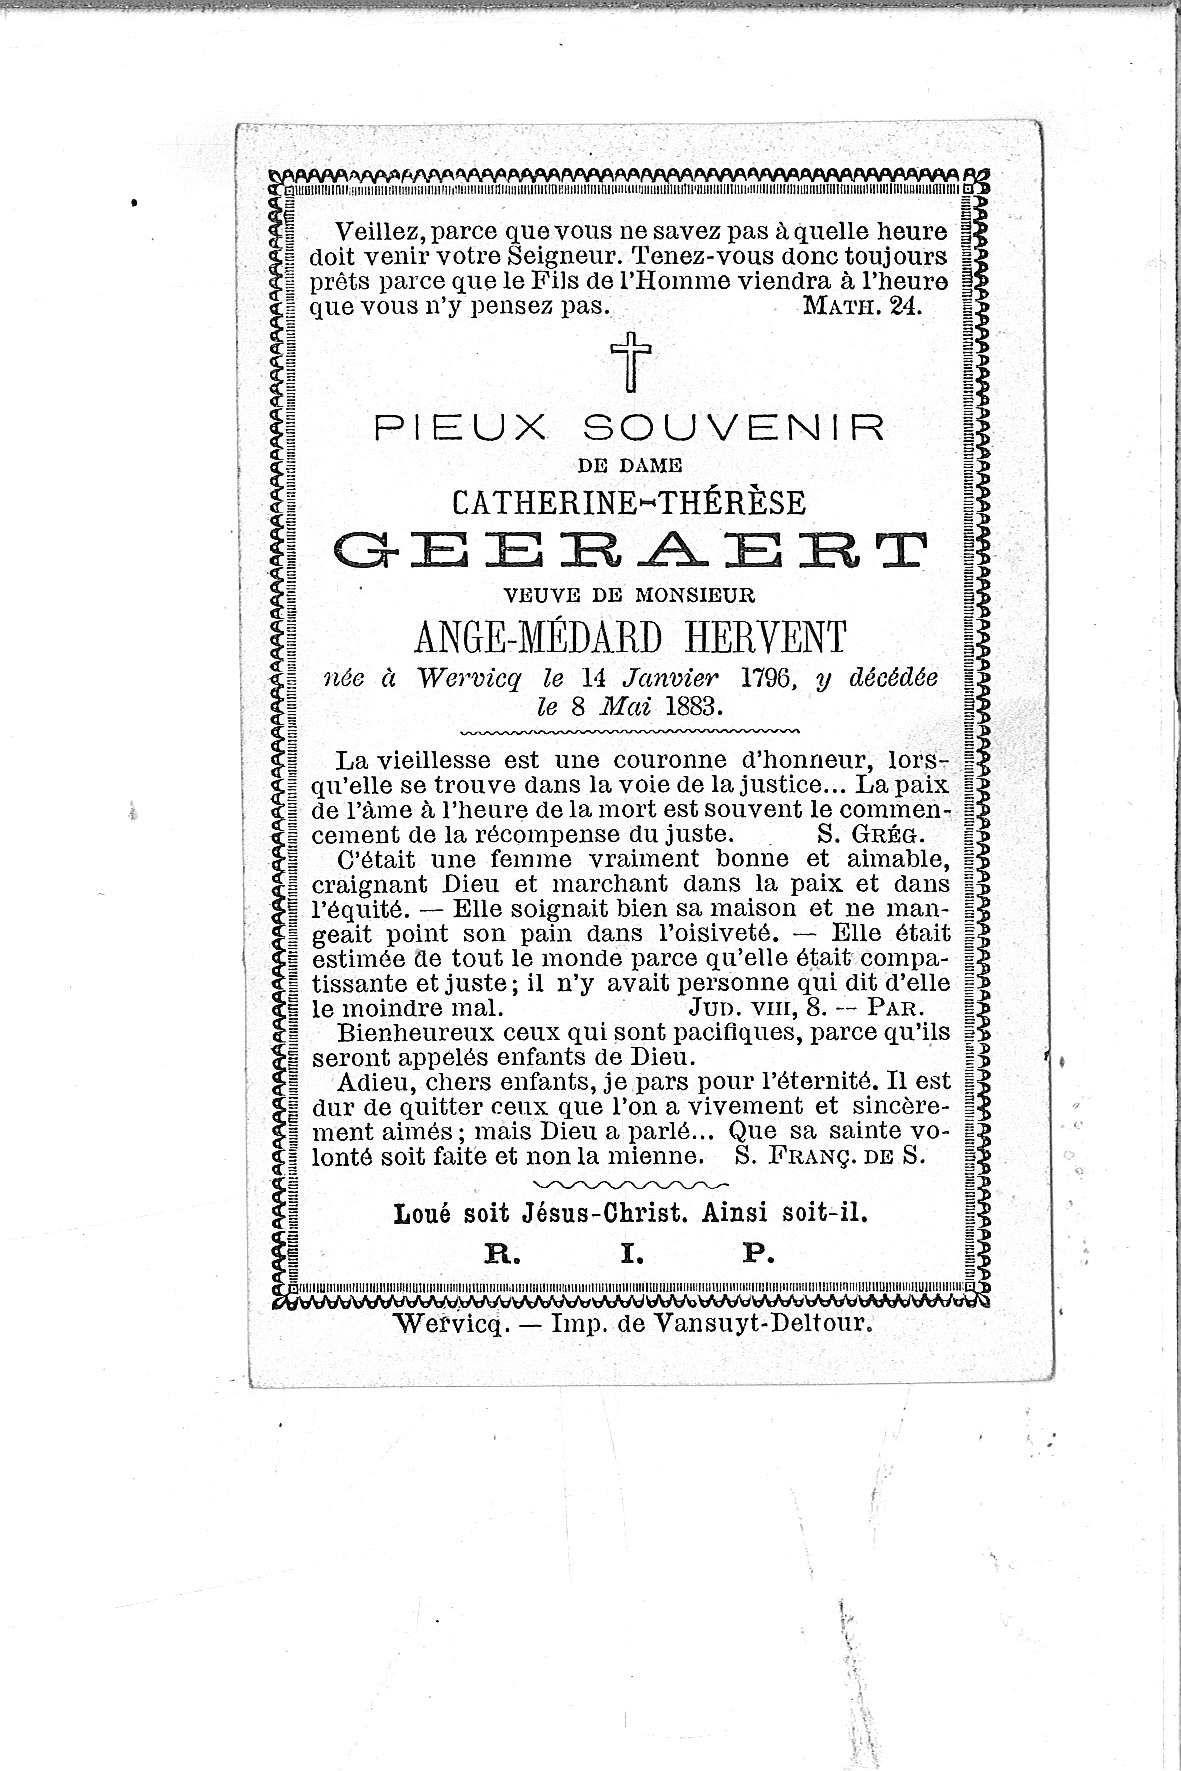 Catherine-Thérése(1883)20130819160133_00004.jpg